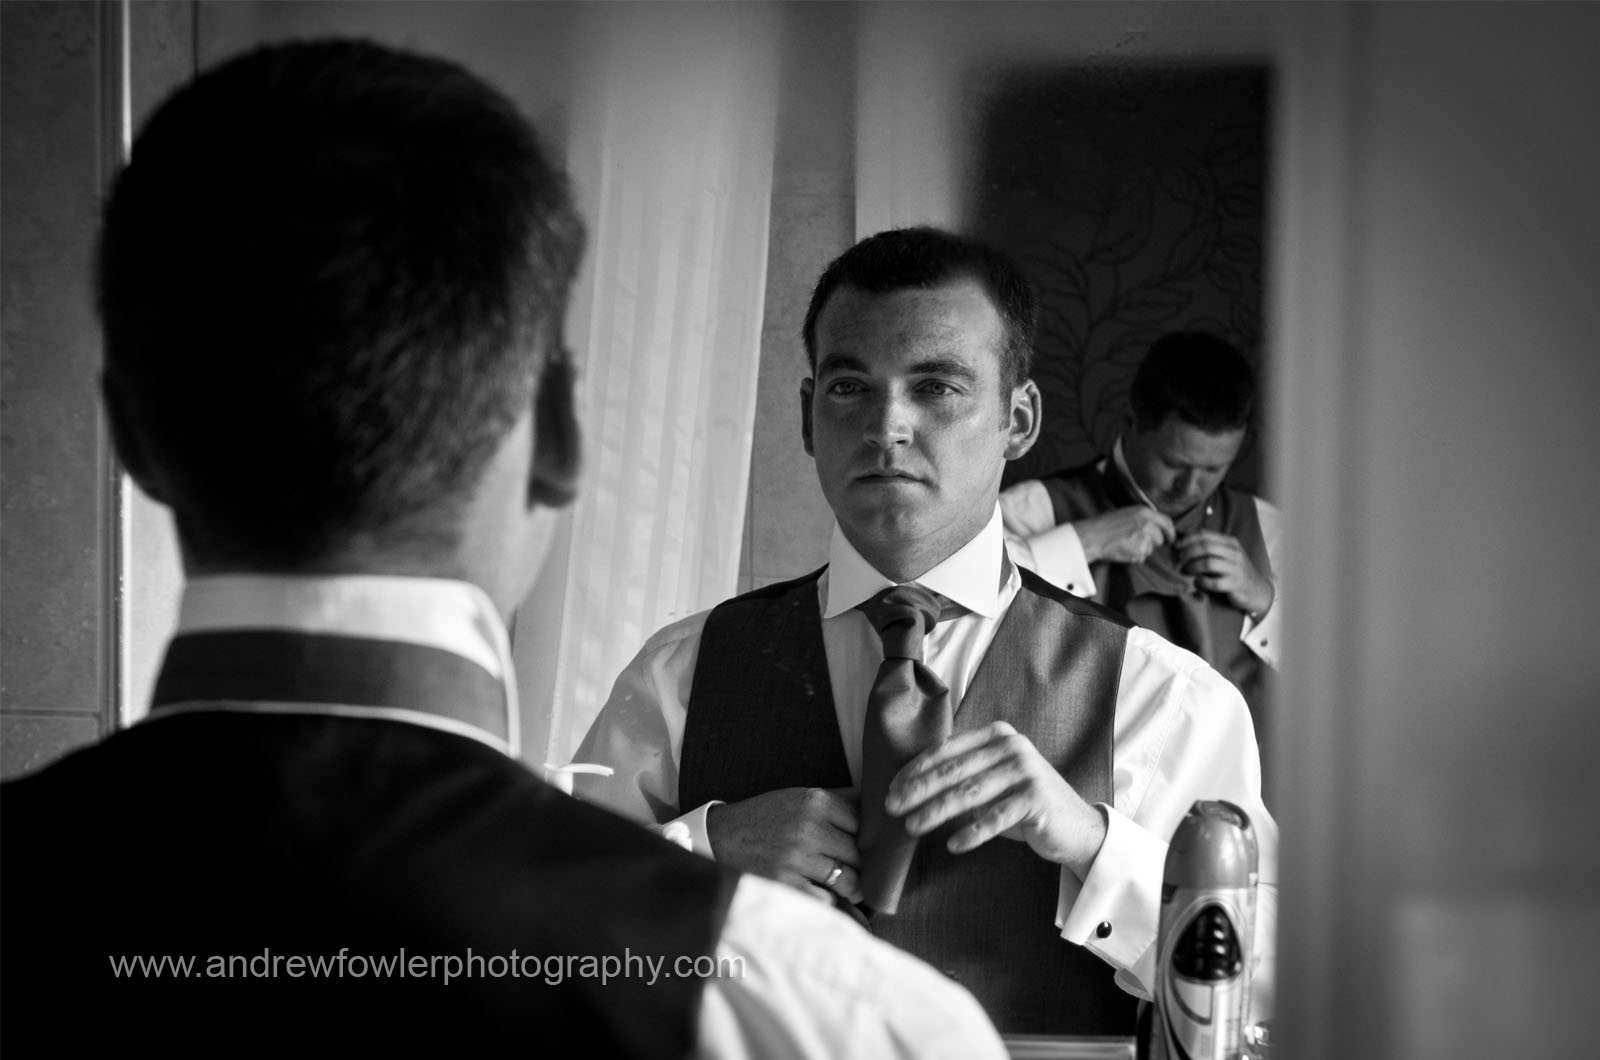 http://1.bp.blogspot.com/-I6_MJdejXug/TdrRrCriEGI/AAAAAAAABHw/TsDK7IJGvwM/s1600/Bridge_Inn_Wedding_04.jpg